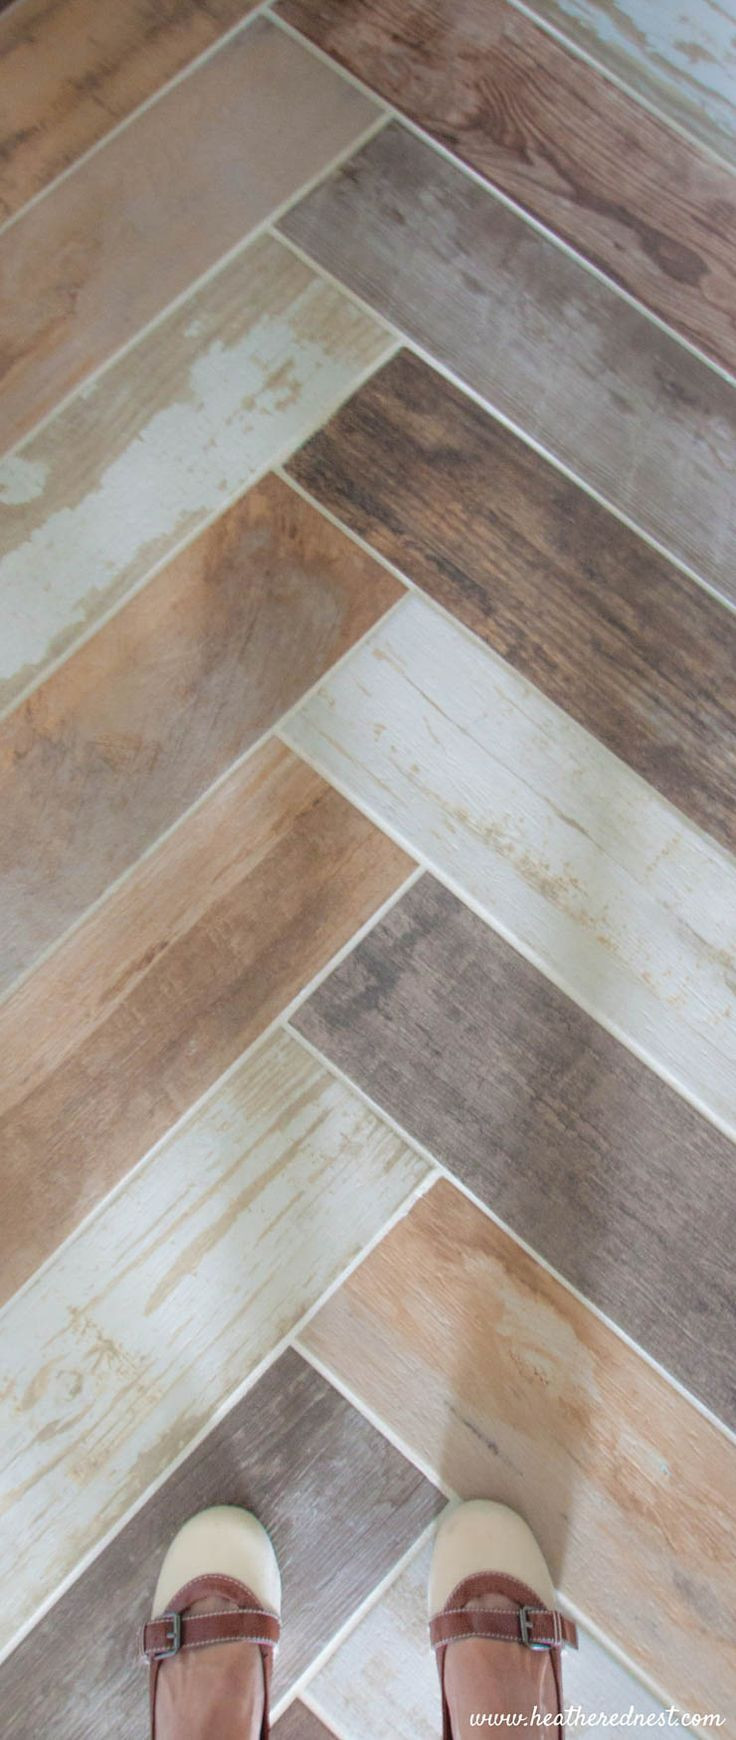 home depot rent hardwood floor sander of 9 best bedroom floors images on pinterest hardwood floors wood with faux wood tile porcelain 6x24 from home depot affiliate from http